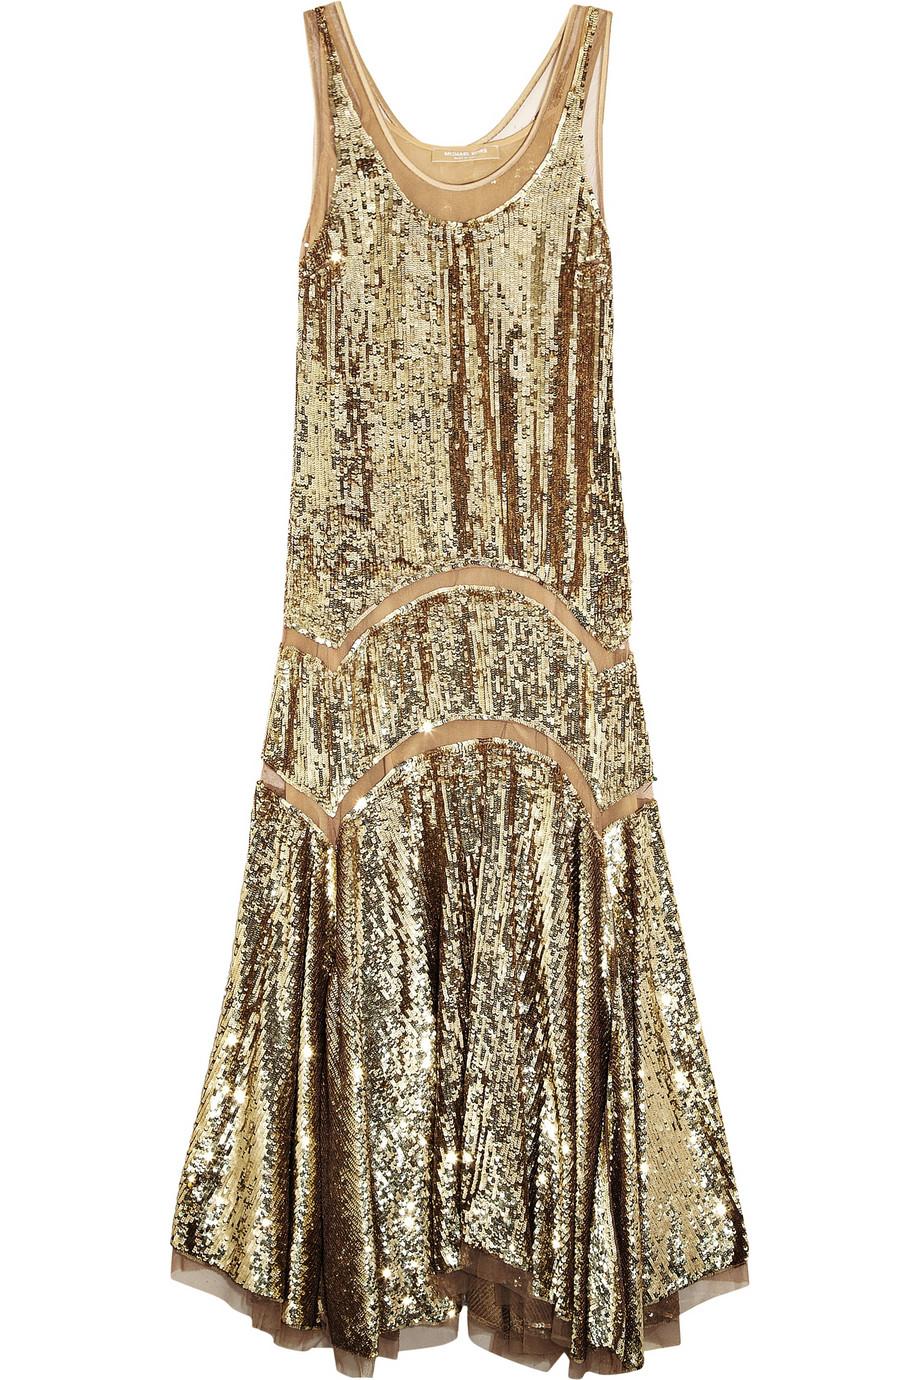 MICHAEL MICHAEL KORS Sequined midi dress